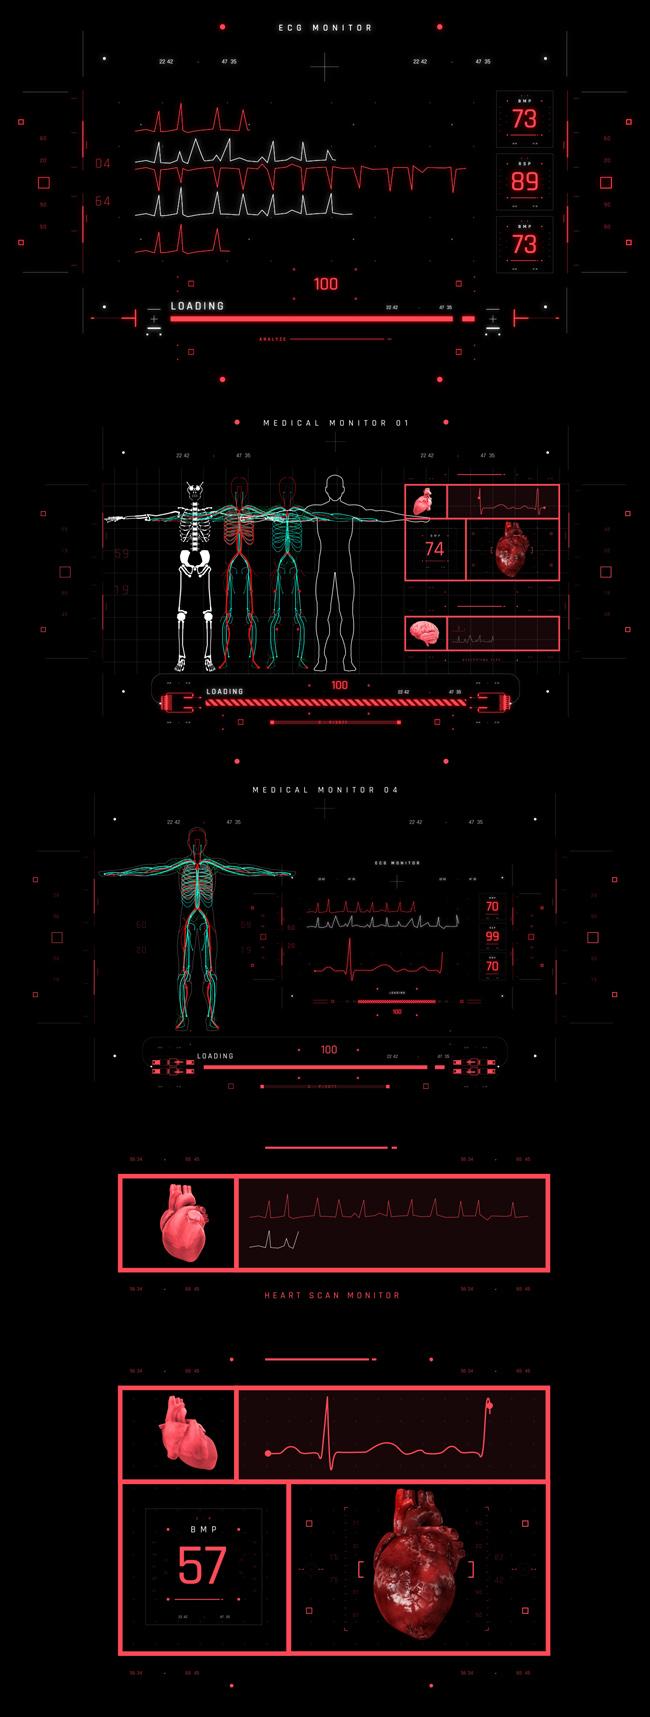 AE脚本-500个HUD高科技赛博朋克UI科幻界面元素动画预设包 Cyberpunk HUD UI 500+ 已修复中文版AE表达式报错插图15